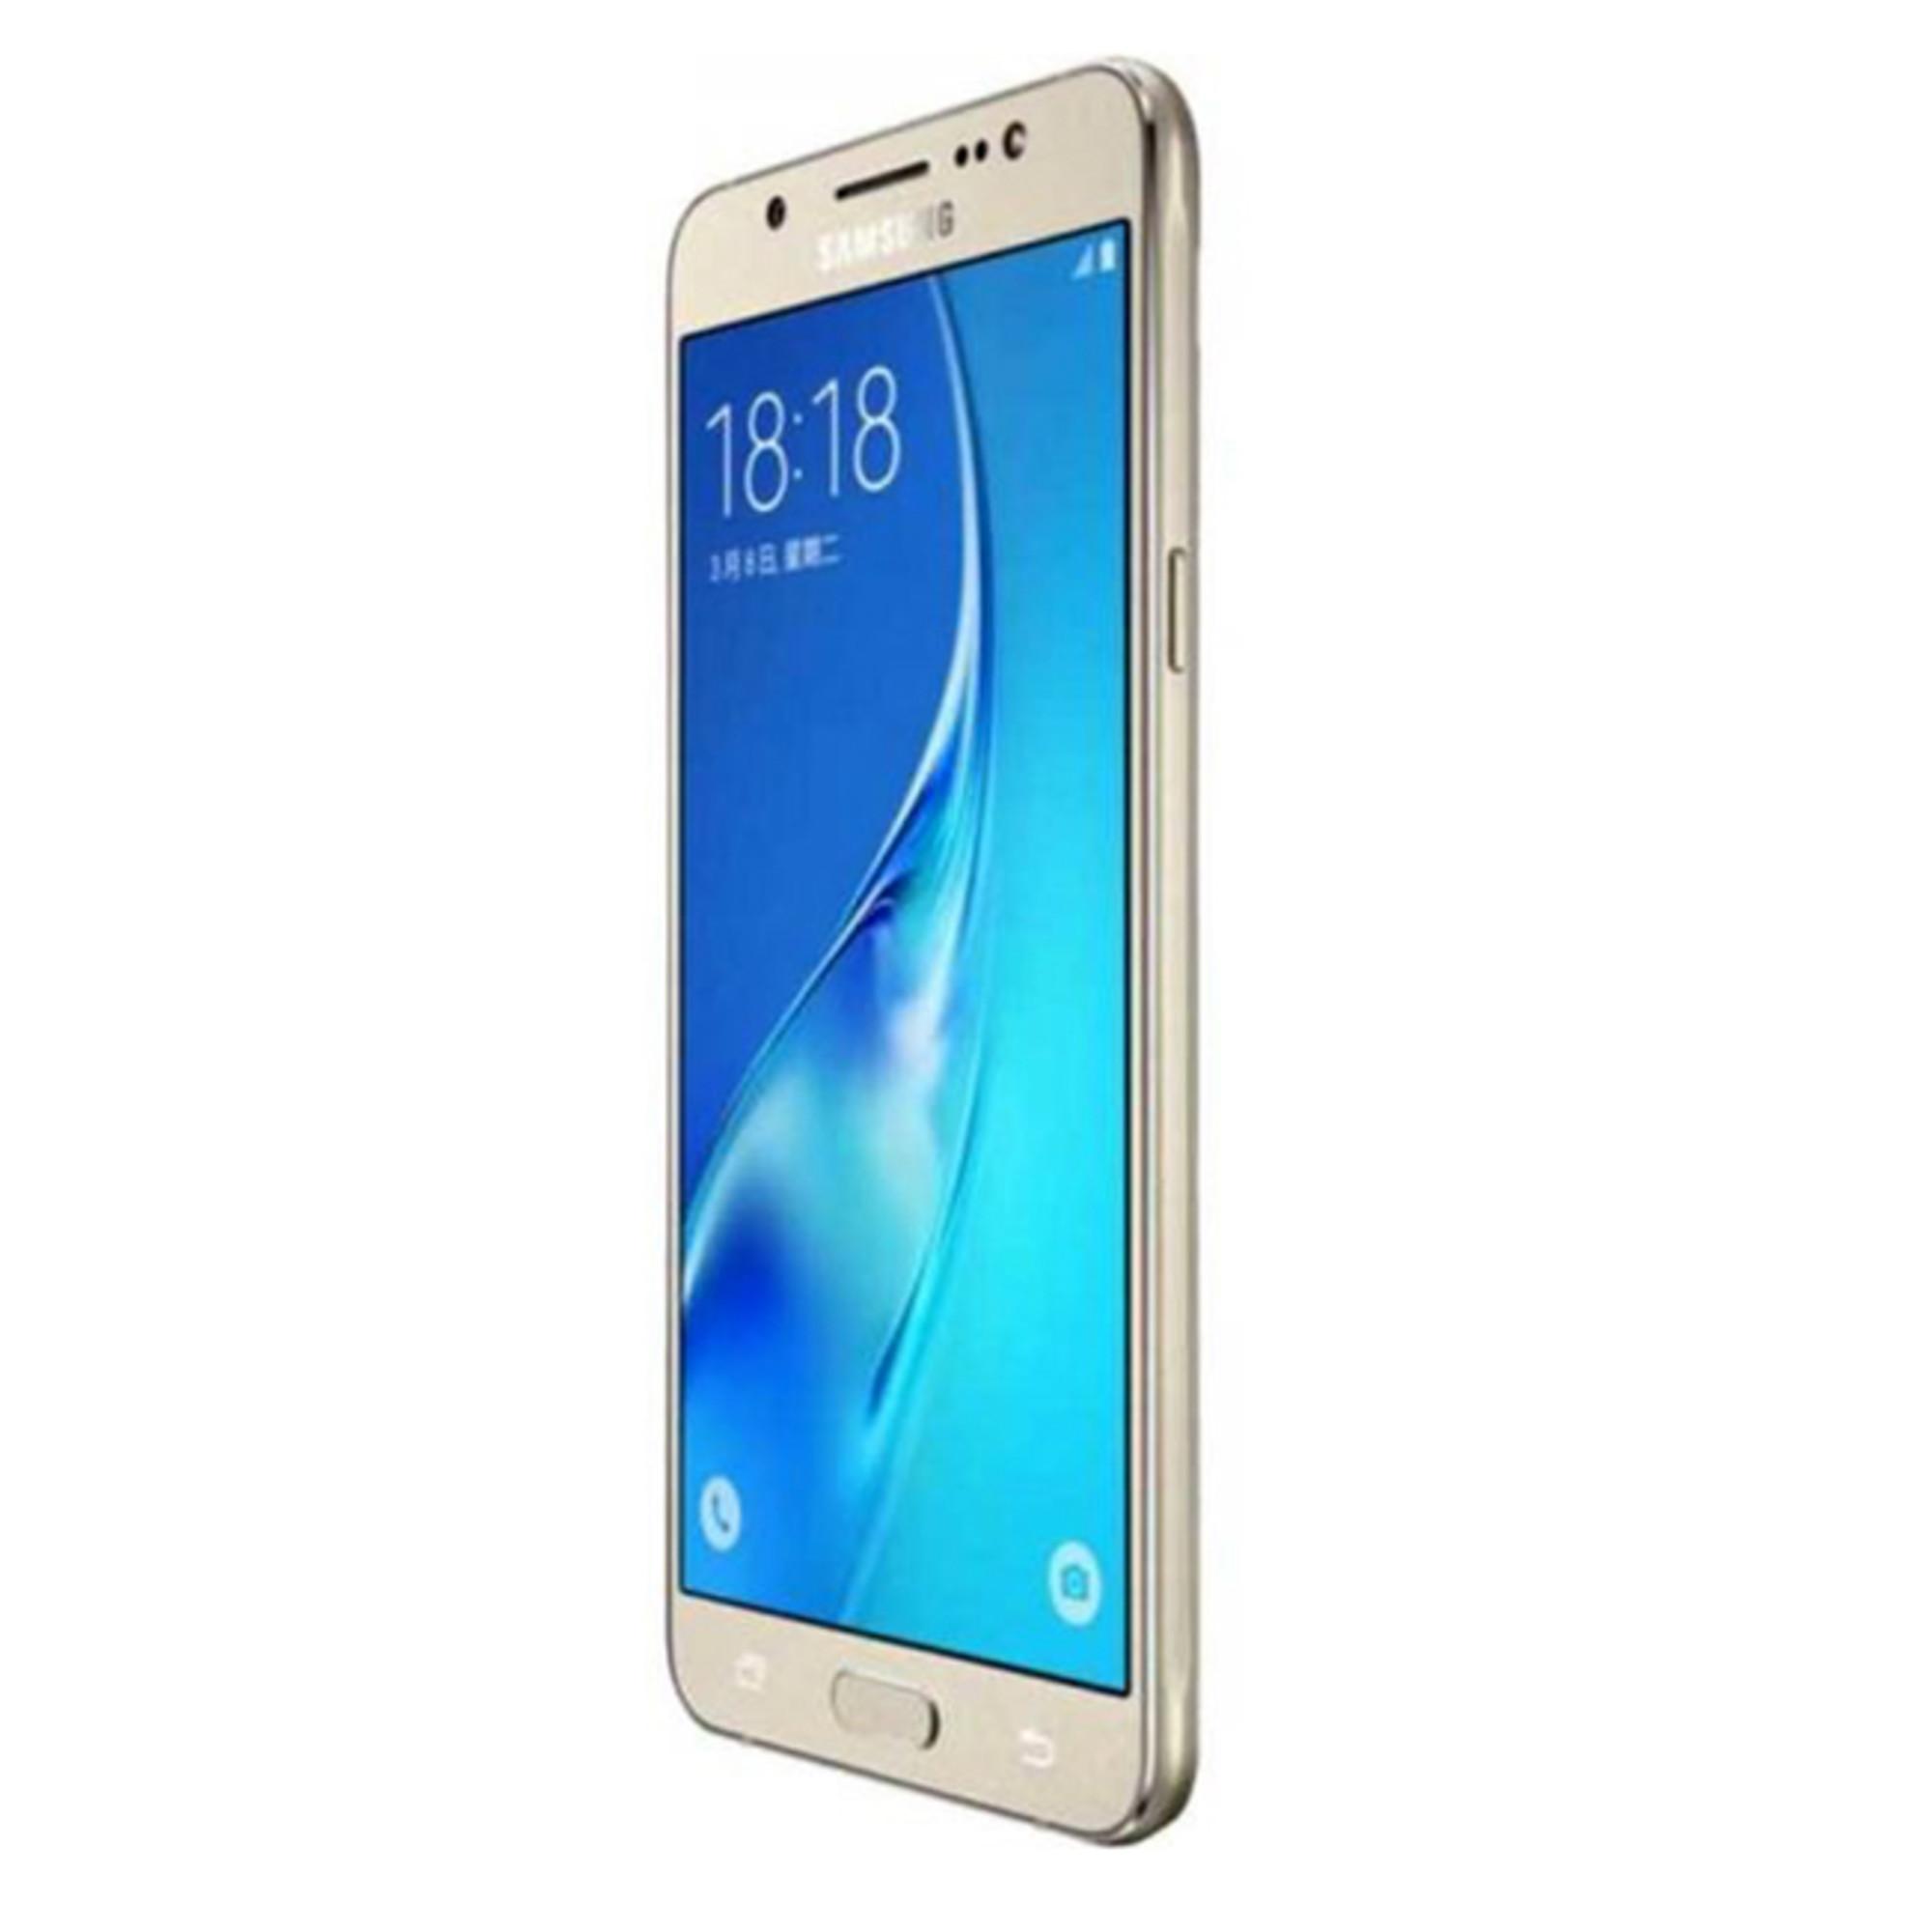 Samsung Galaxy J5 J510M Unlocked GSM 4G LTE Quad-Core Phone w/ 13MP Camera | eBay